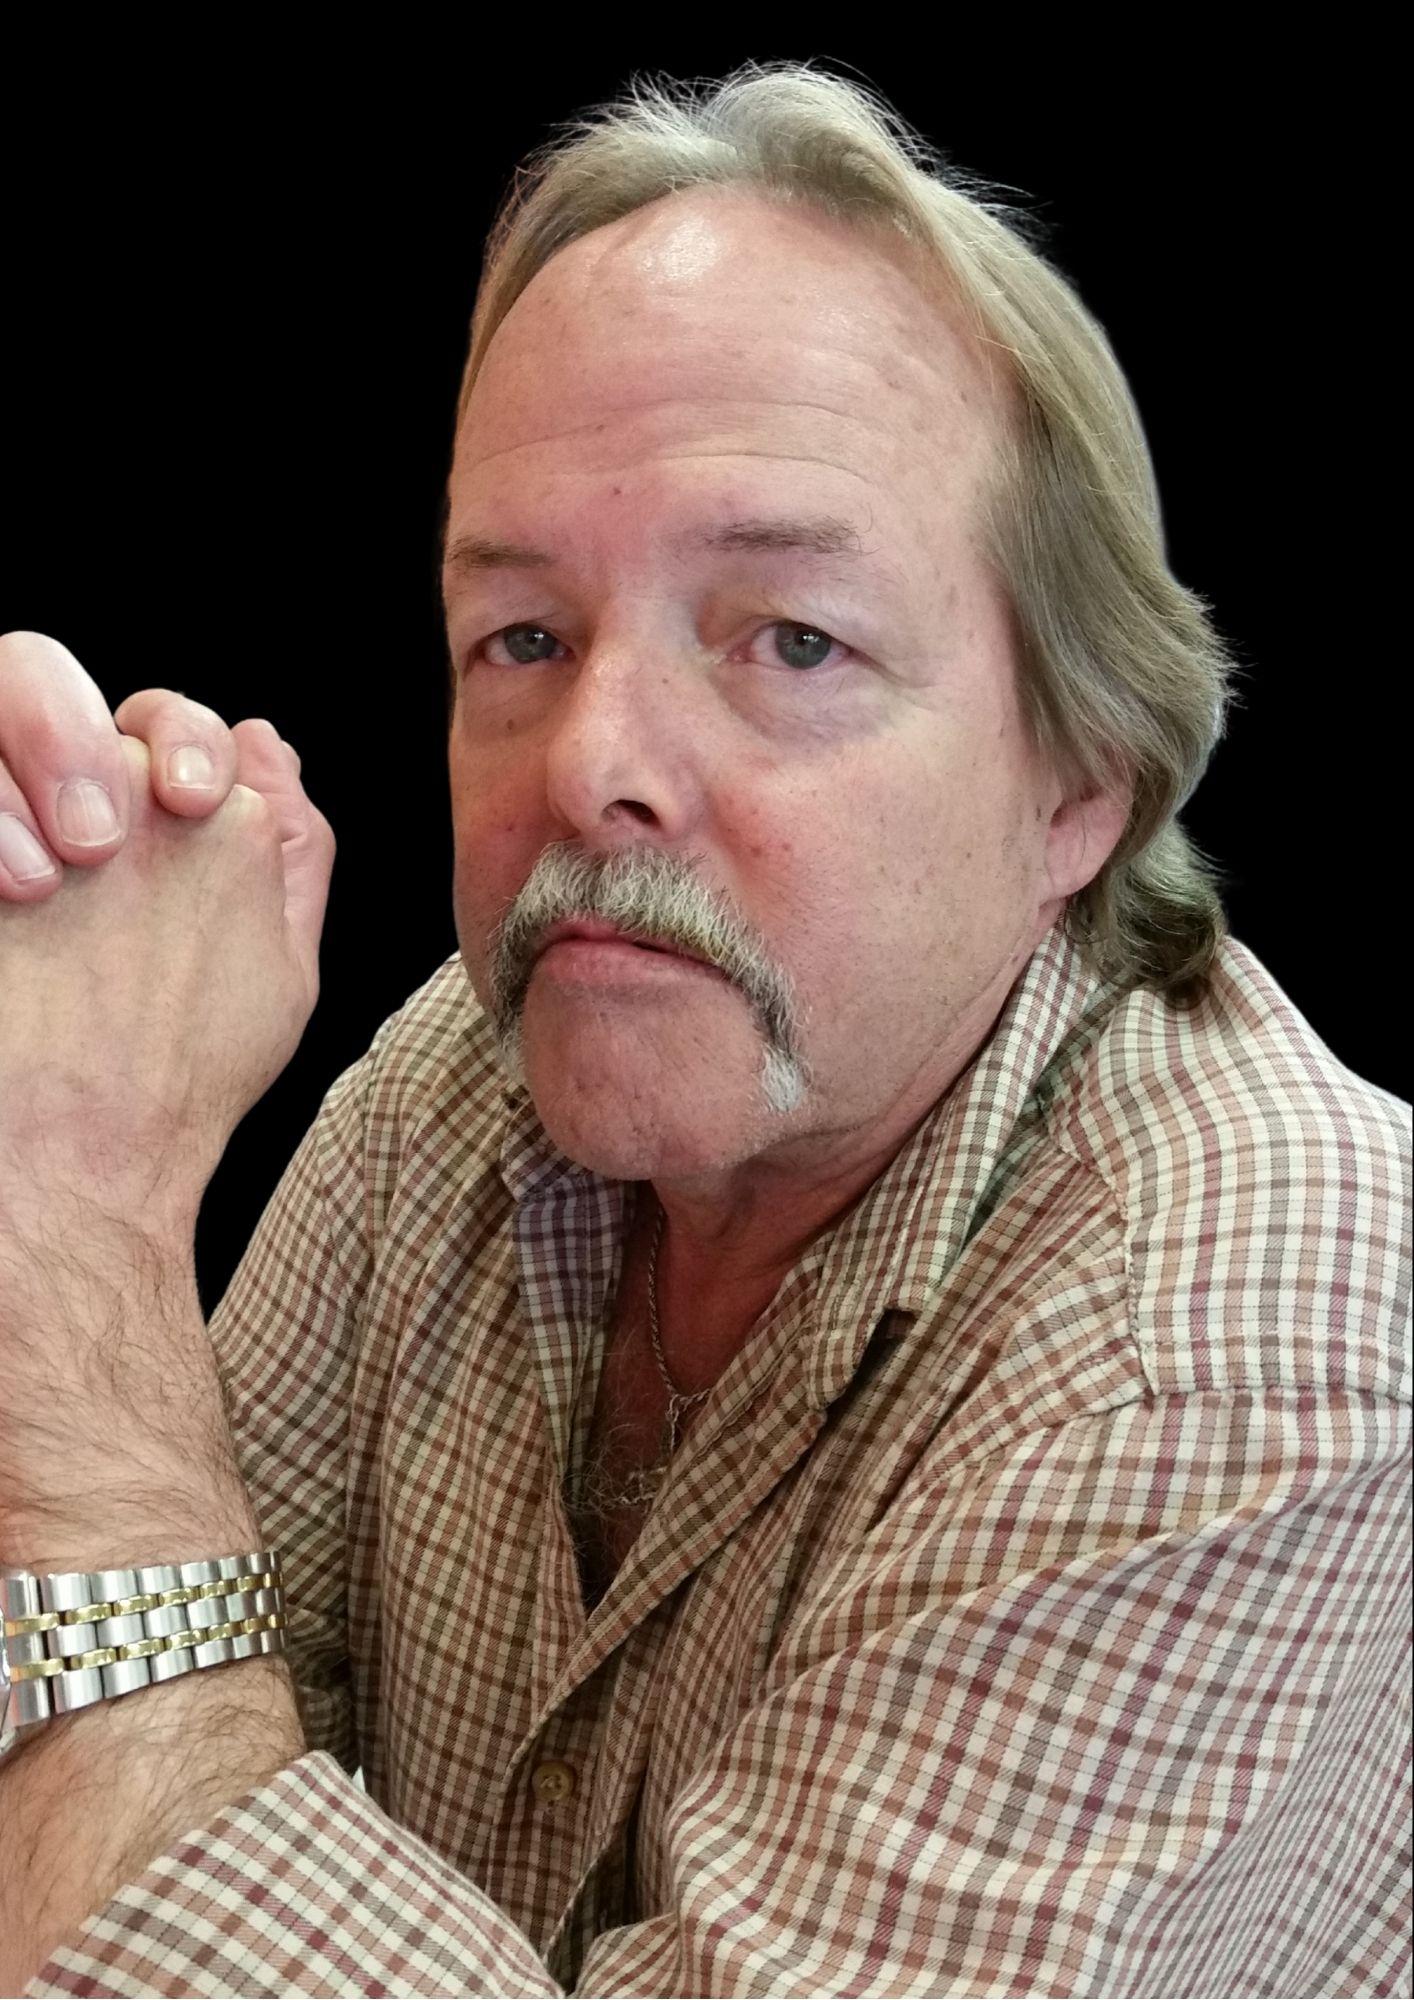 Keith Black; Senior Change Management Representative